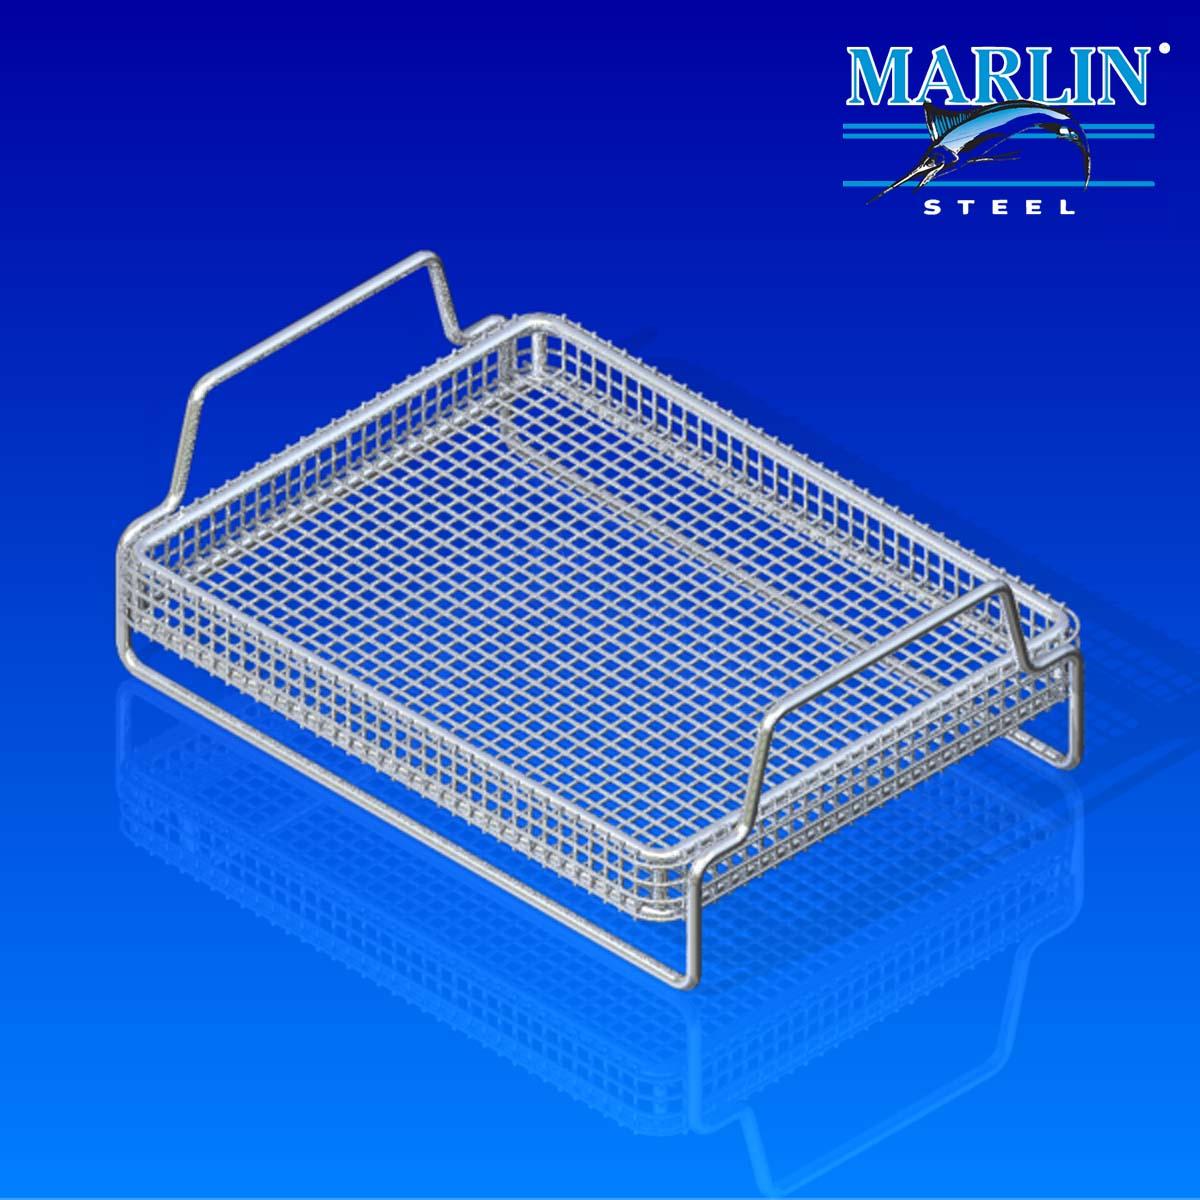 Marlin Steel Basket with Handles 907001